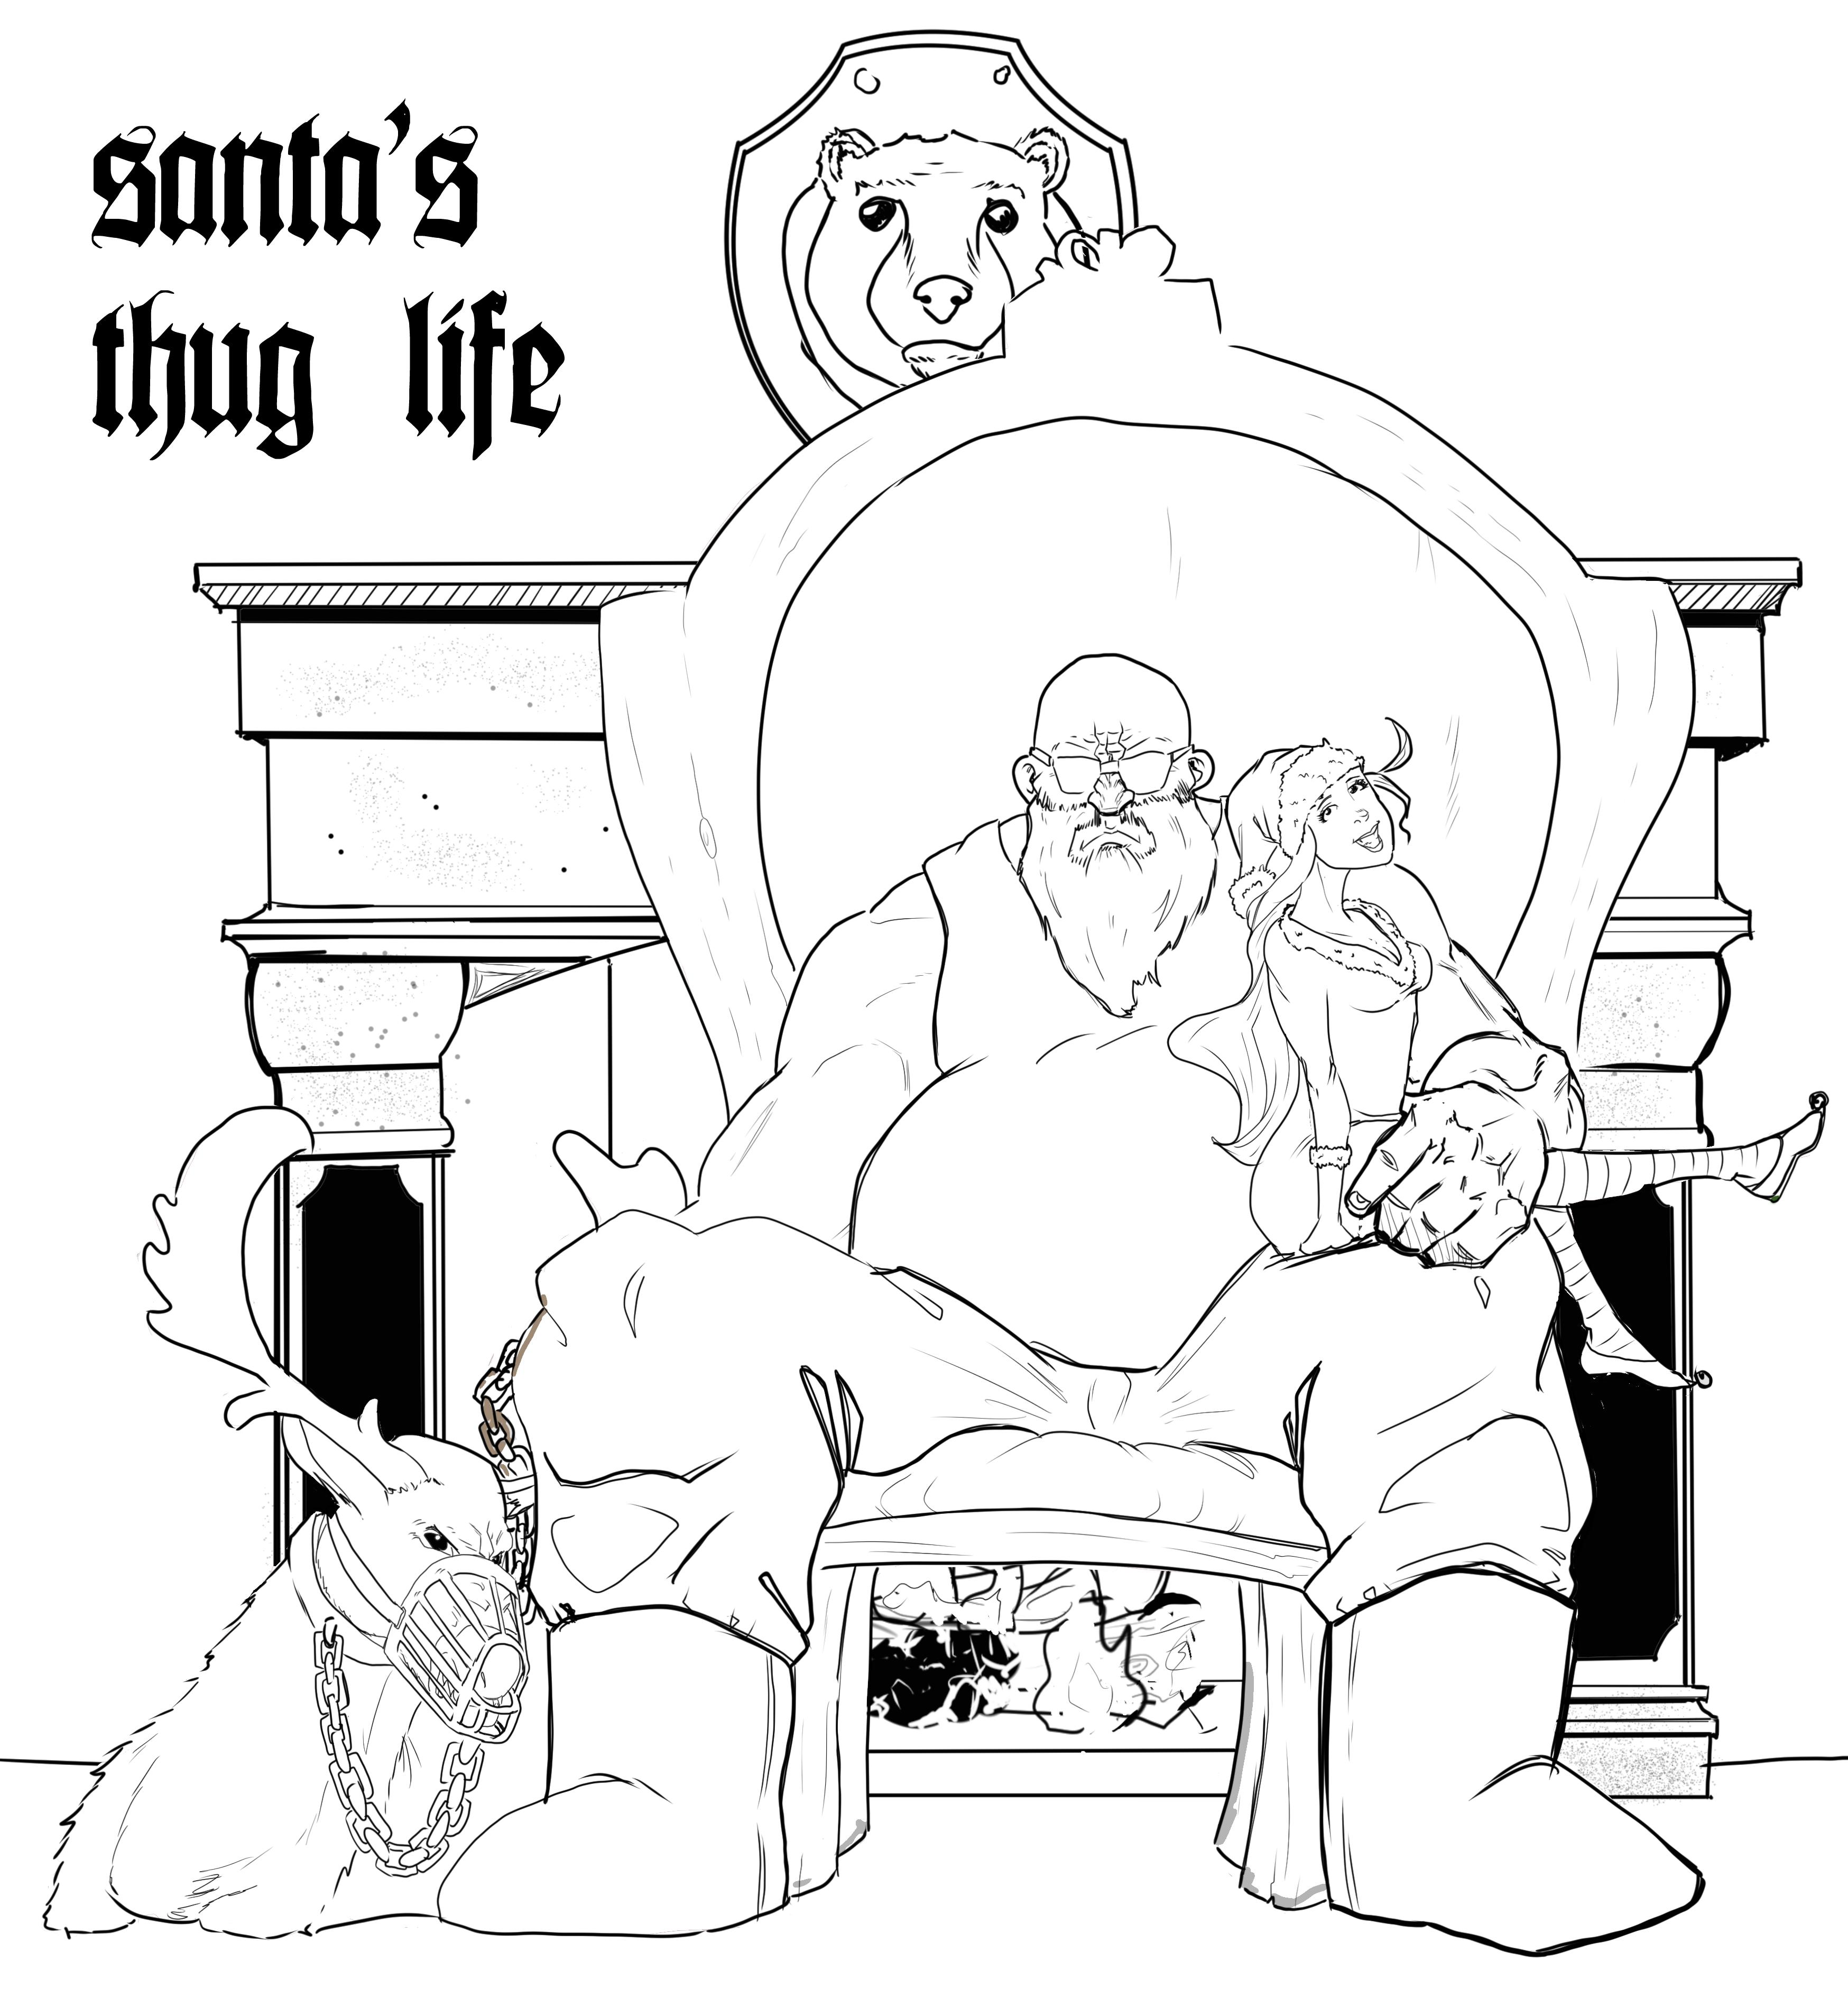 santa's thug life